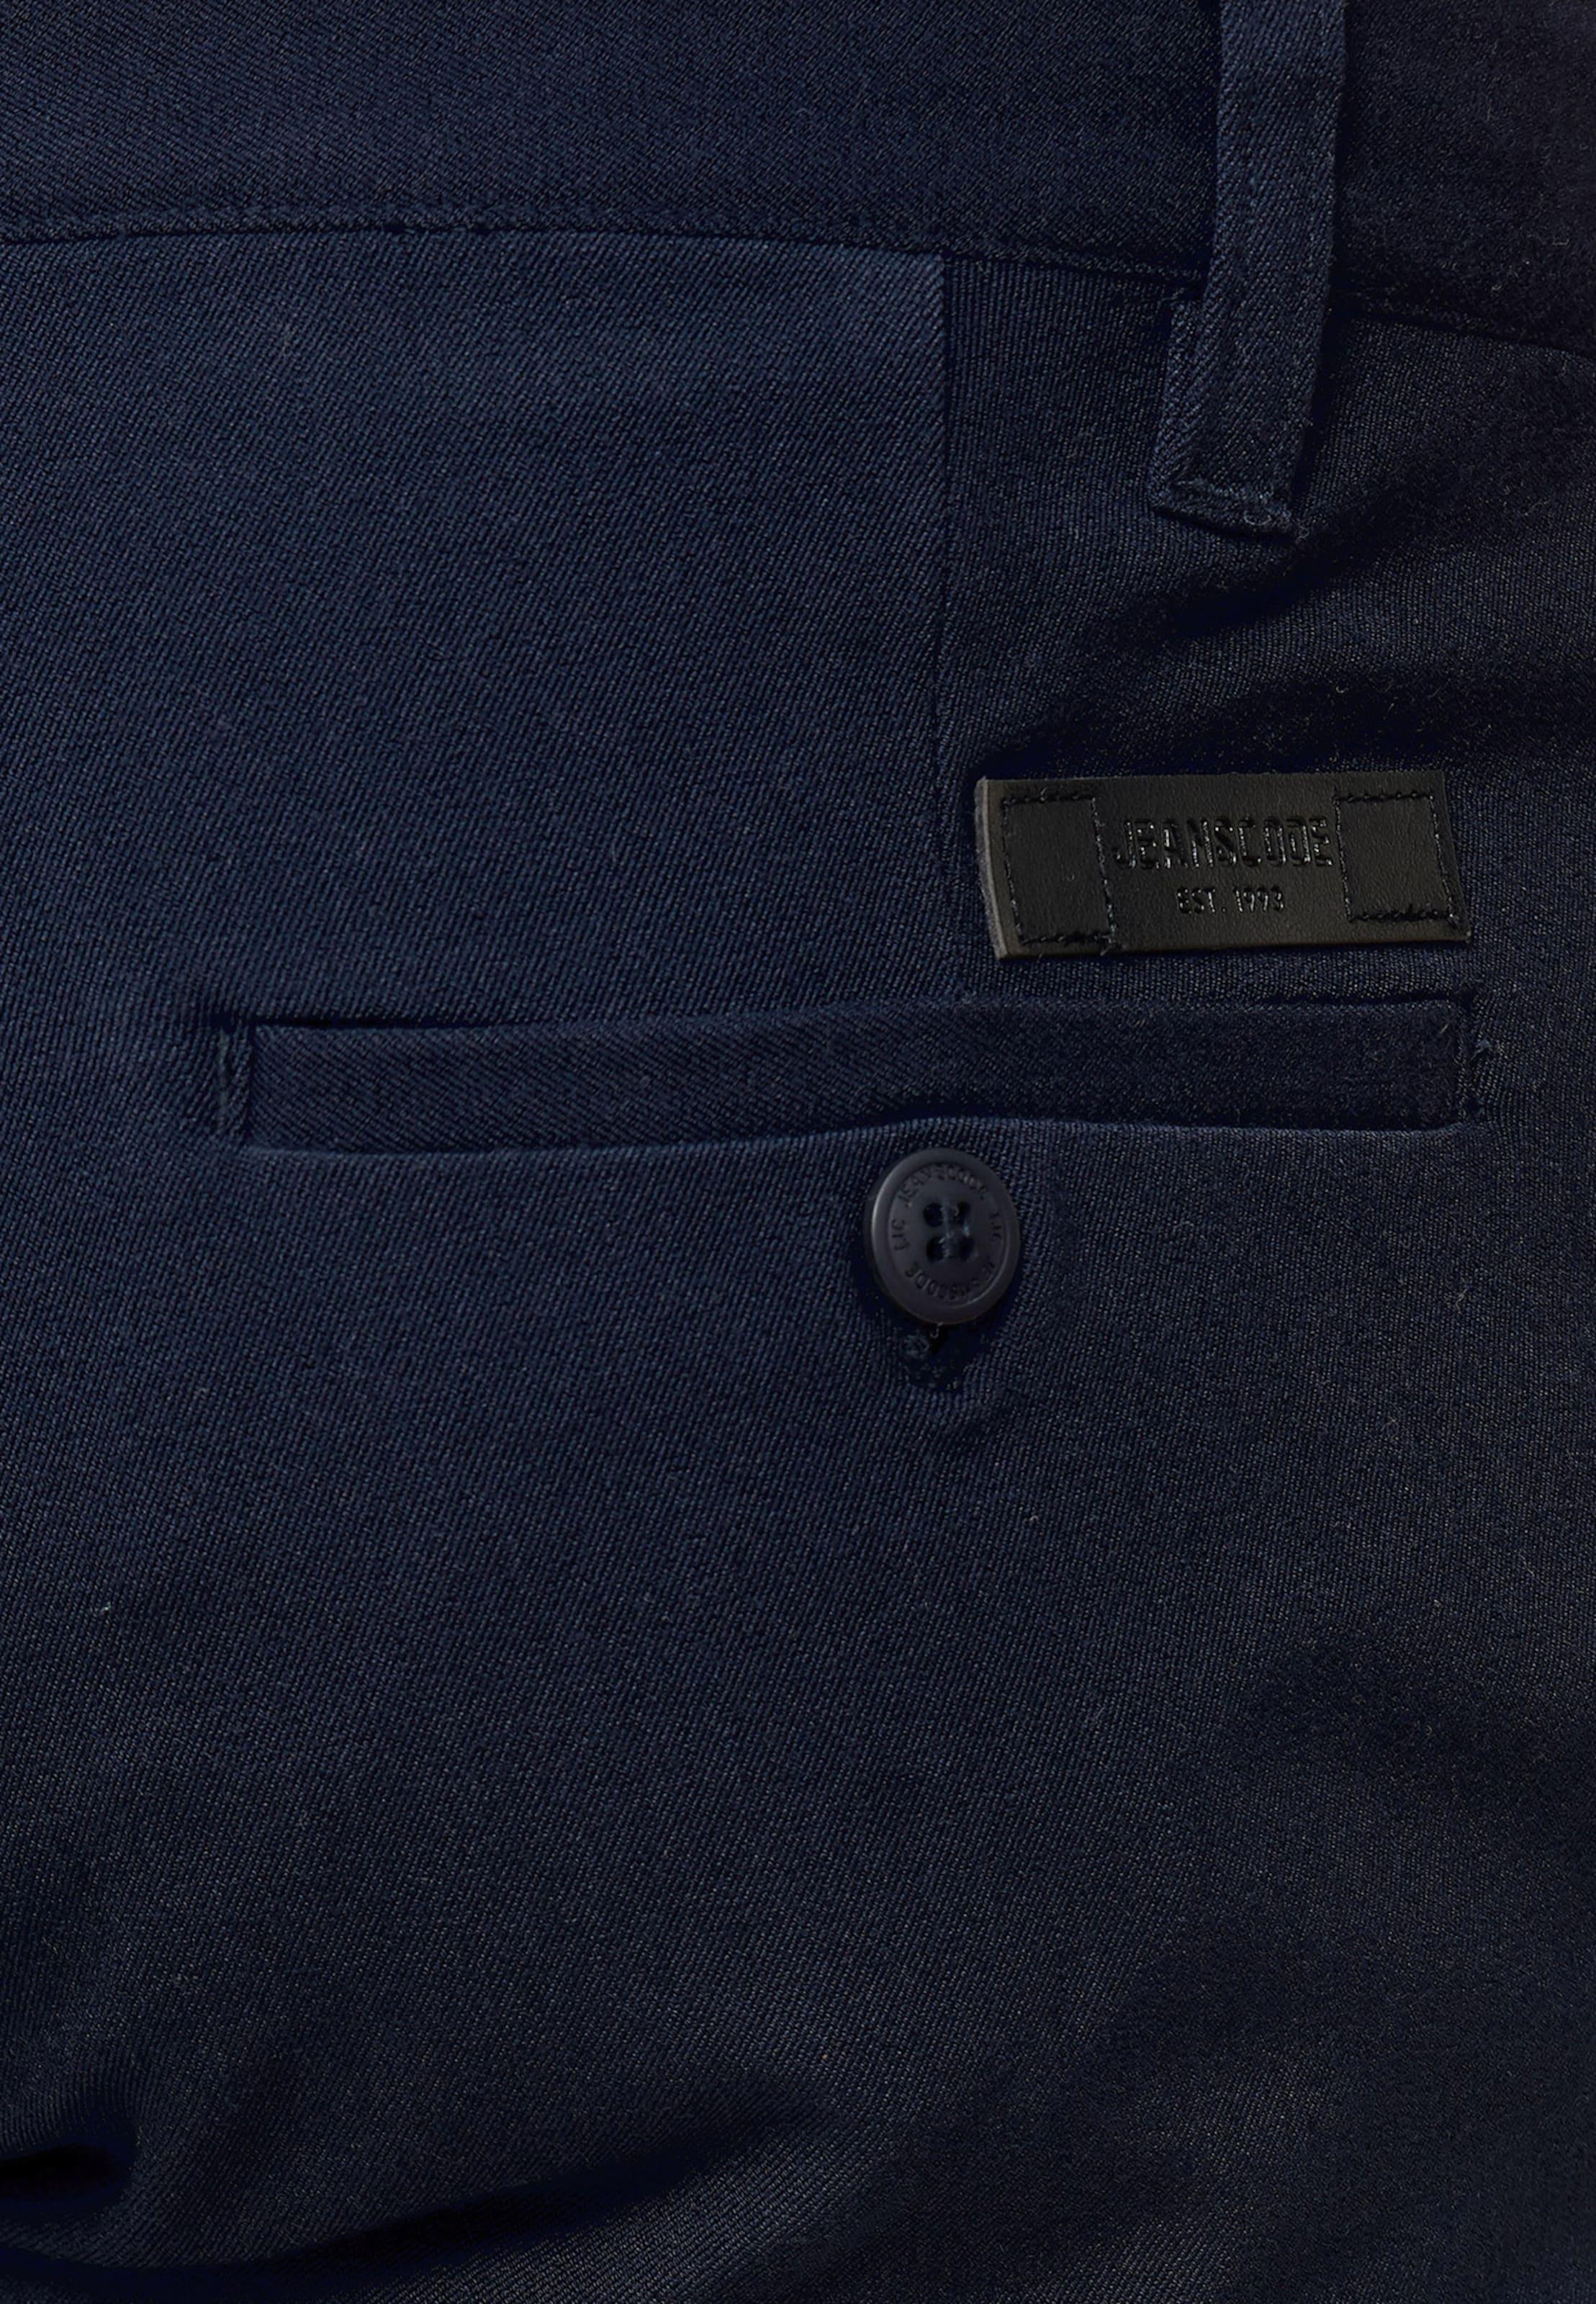 Pantalon Indicode Jeans Bleu En Nuit 'chiltern' BsQrdxthC